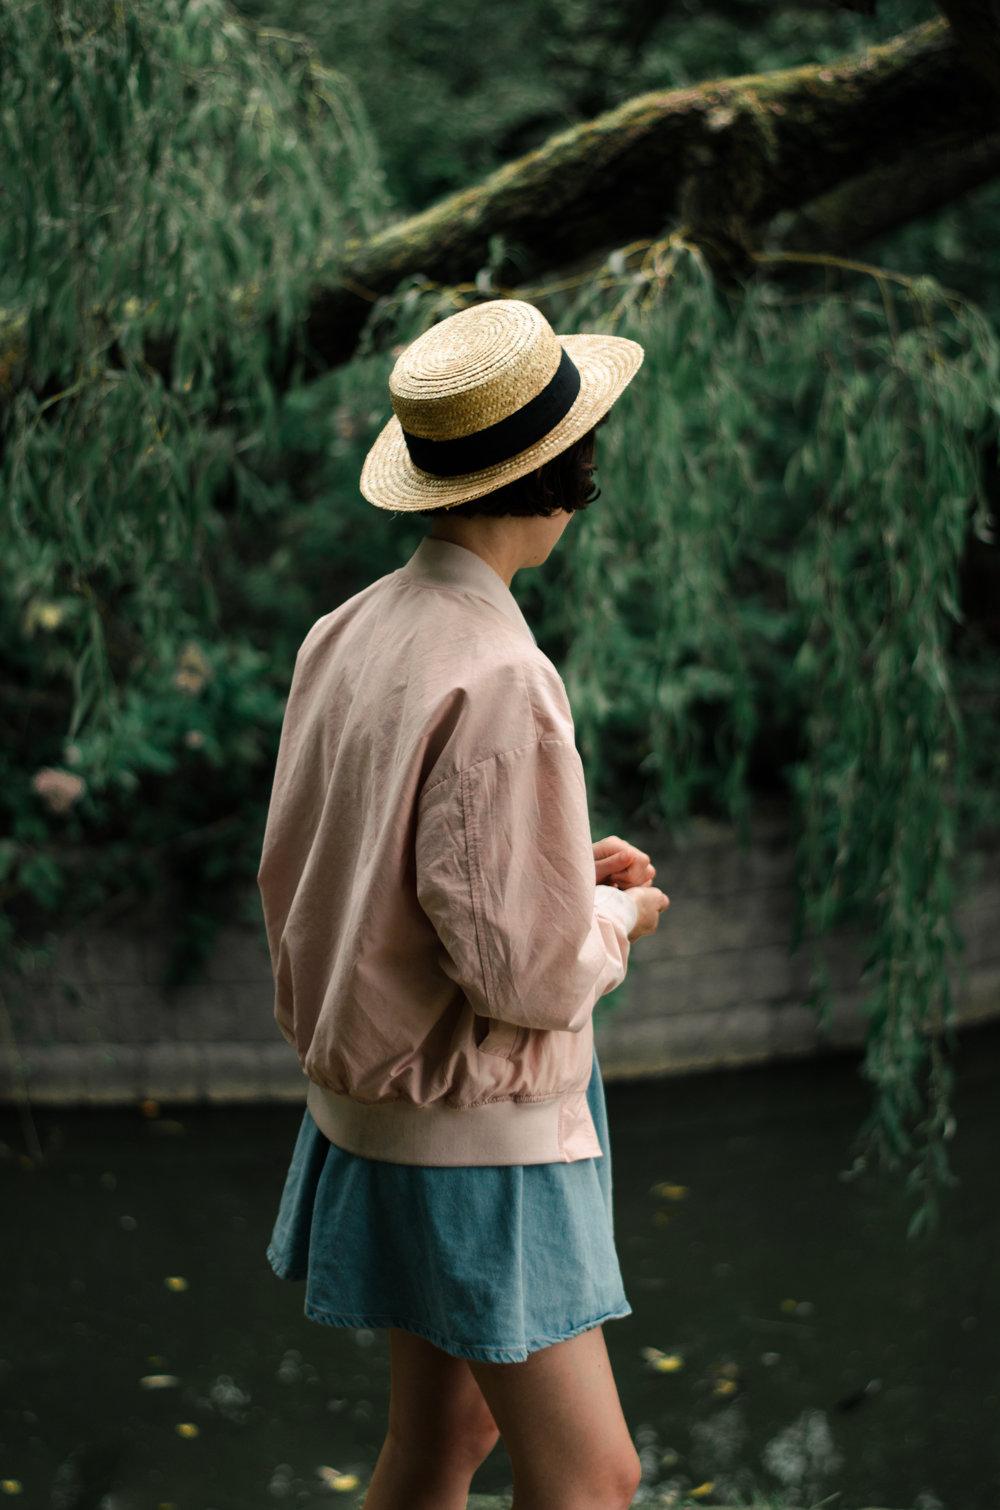 Ellie-Portrait-Session-Aiste-Saulyte-Photography-11-8-17-63.jpg